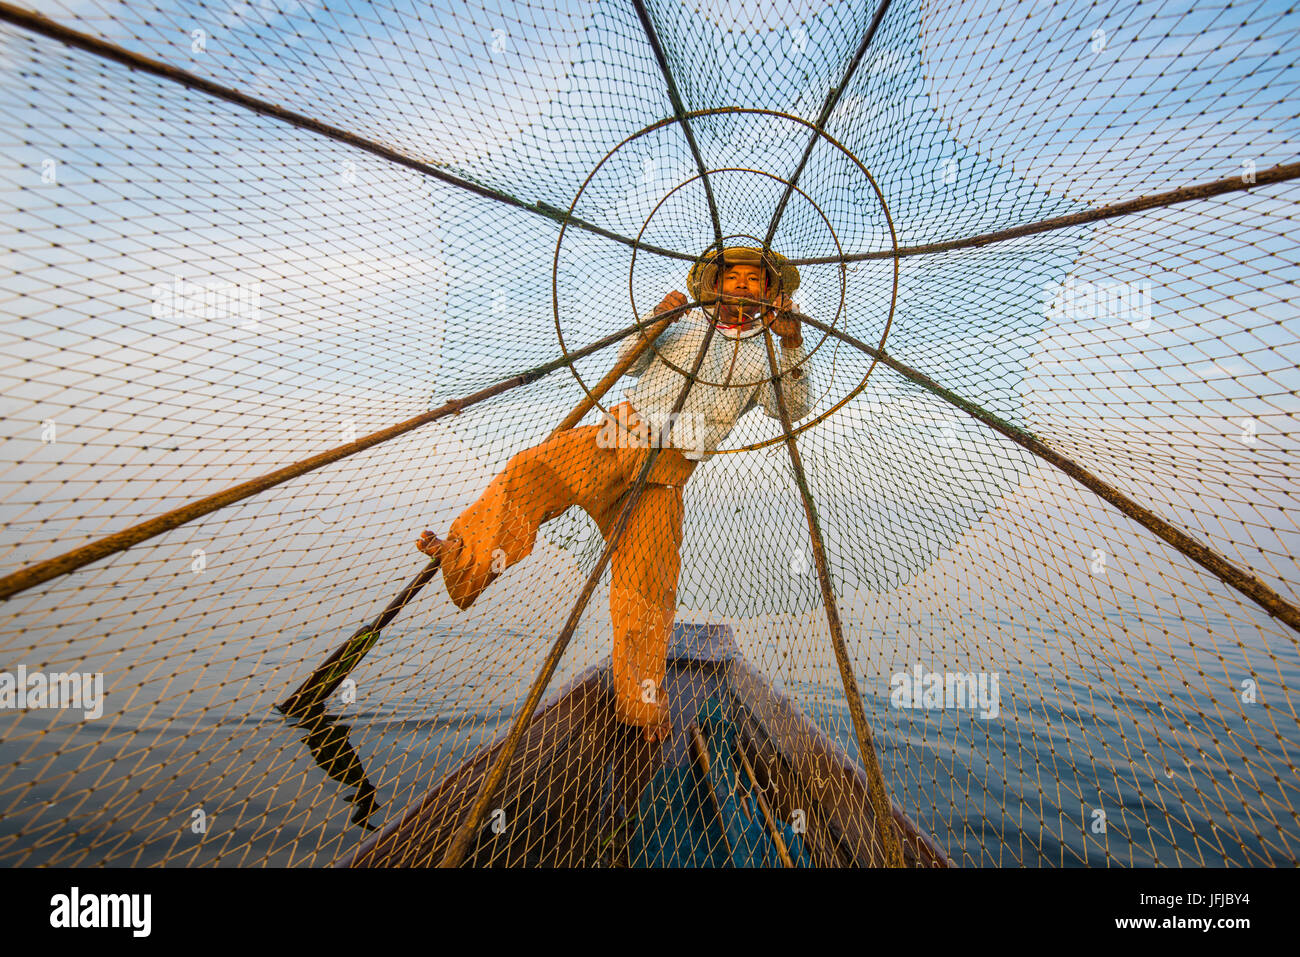 Lago Inle, Nyaungshwe, stato Shan, Myanmar, Fisherman guardando attraverso la rete da pesca, Immagini Stock